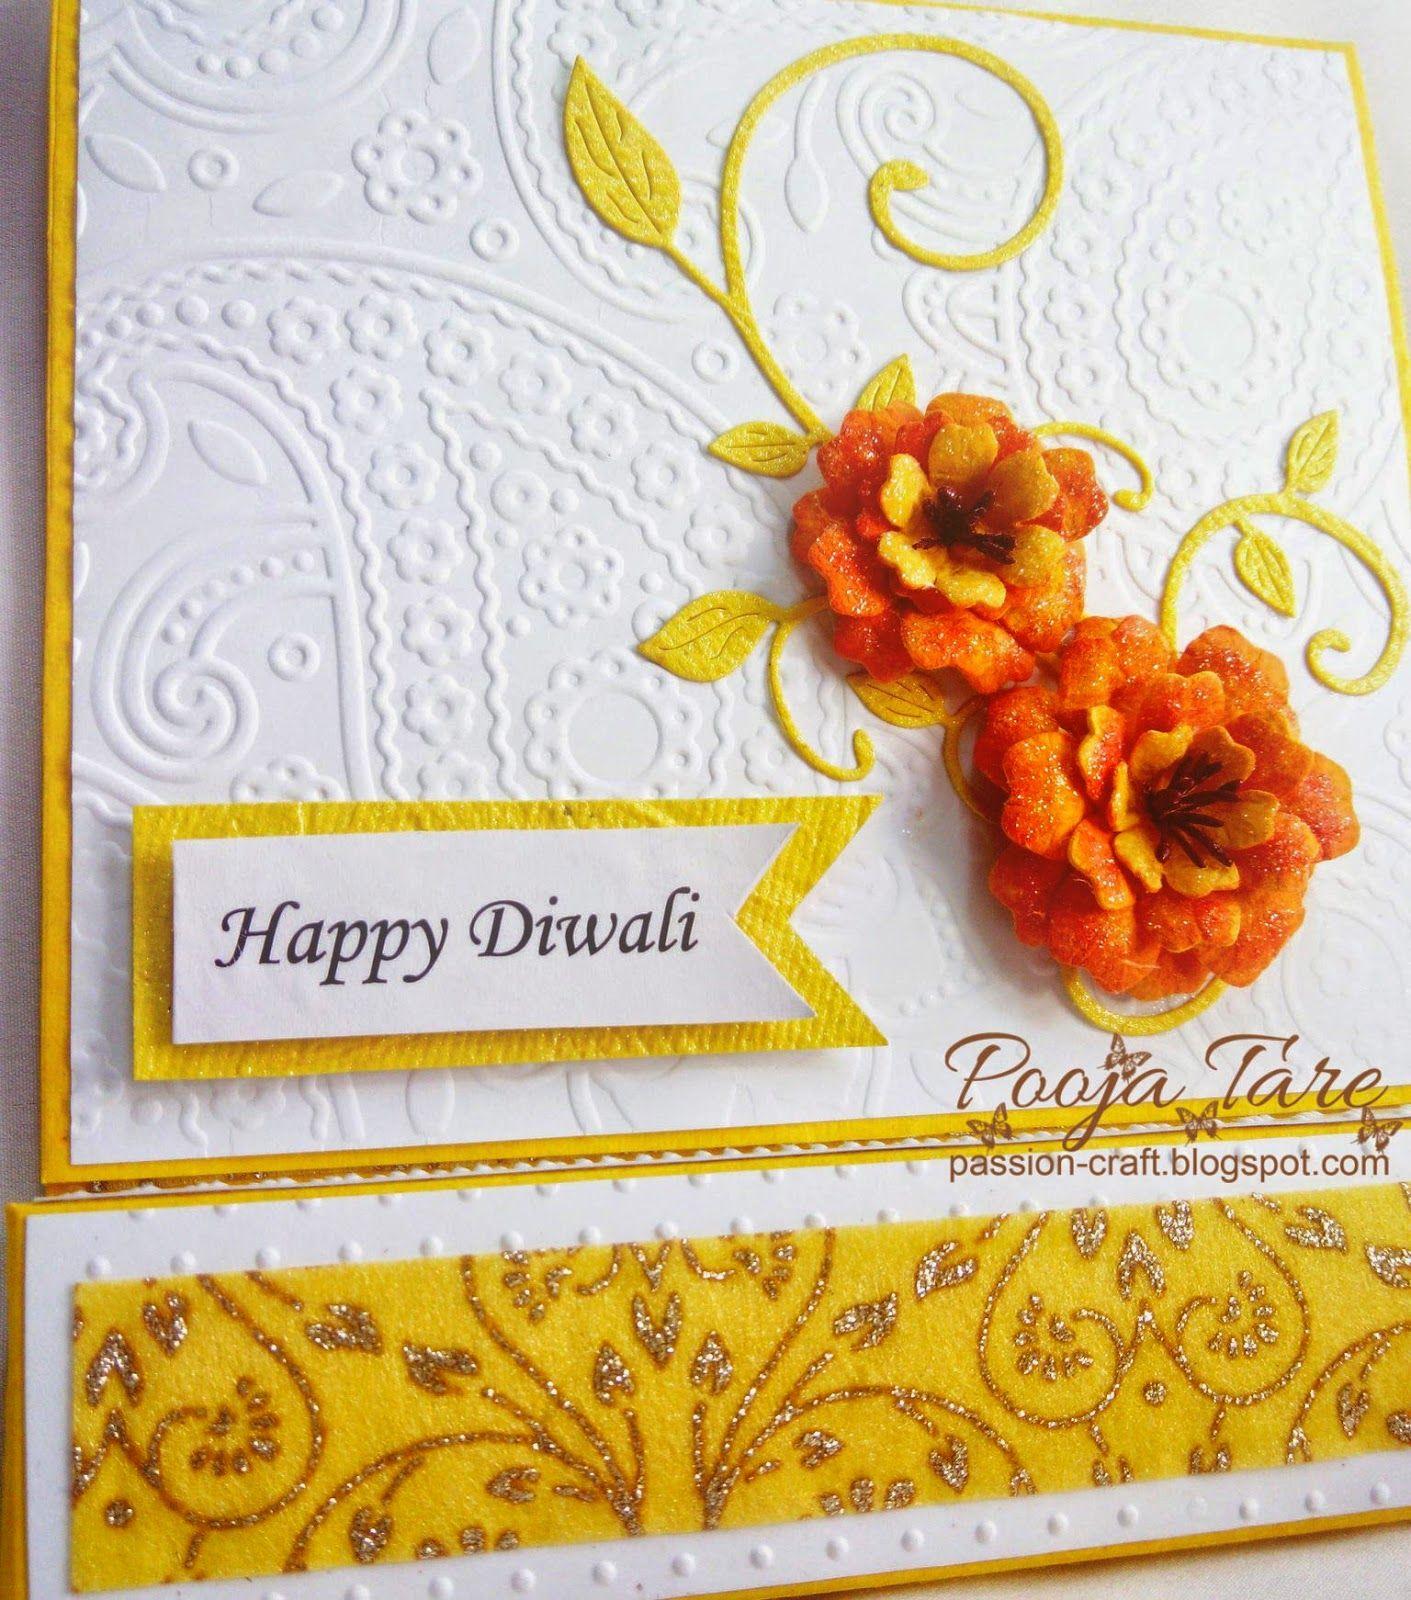 Diwali Card Tea Light Candle Card Flowers Handmade By Joy Craft Dies Floral Flourishes Flower 4 Handmade Diwali Greeting Cards Diwali Cards Candle Cards